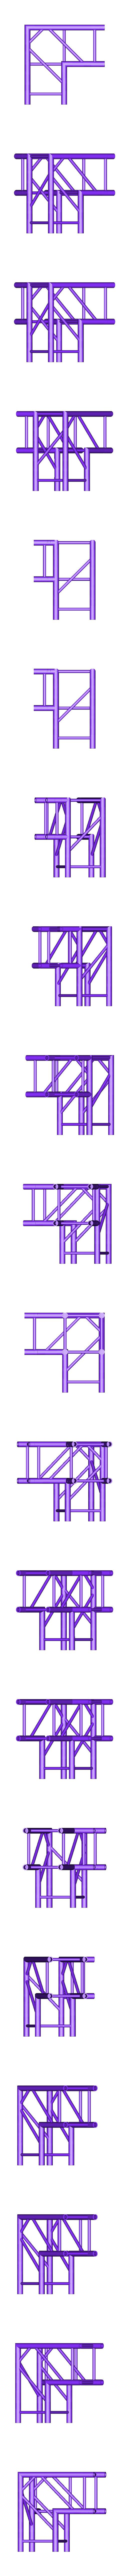 Truss 4 Punkt Traverse GWK021.1 3-Weg Ecke 90° (x2).stl Download STL file 1:18 Truss 4 Punkt Traverse Messestand ZSB1000 • Template to 3D print, CrossModellbau